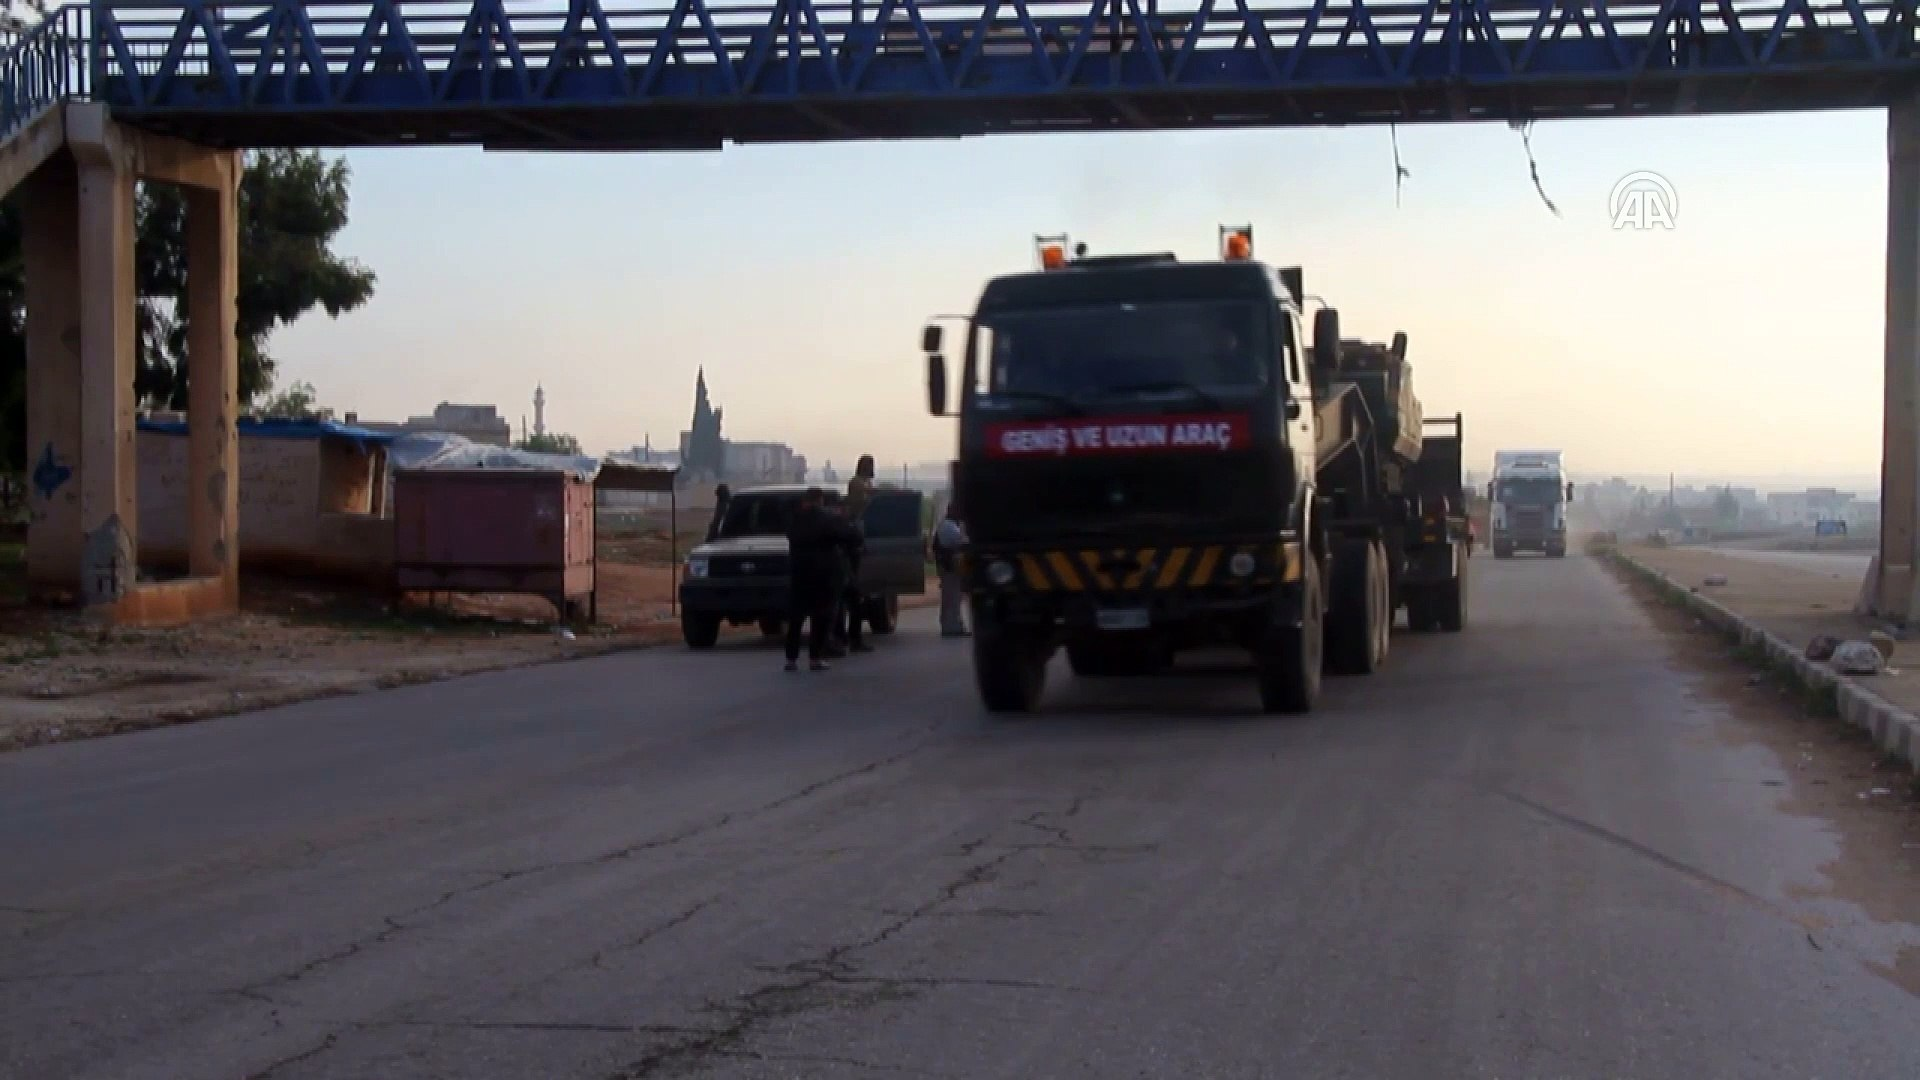 TSK İdlib'de 11'inci ateşkes gözlem noktasını kurdu - İDLİB